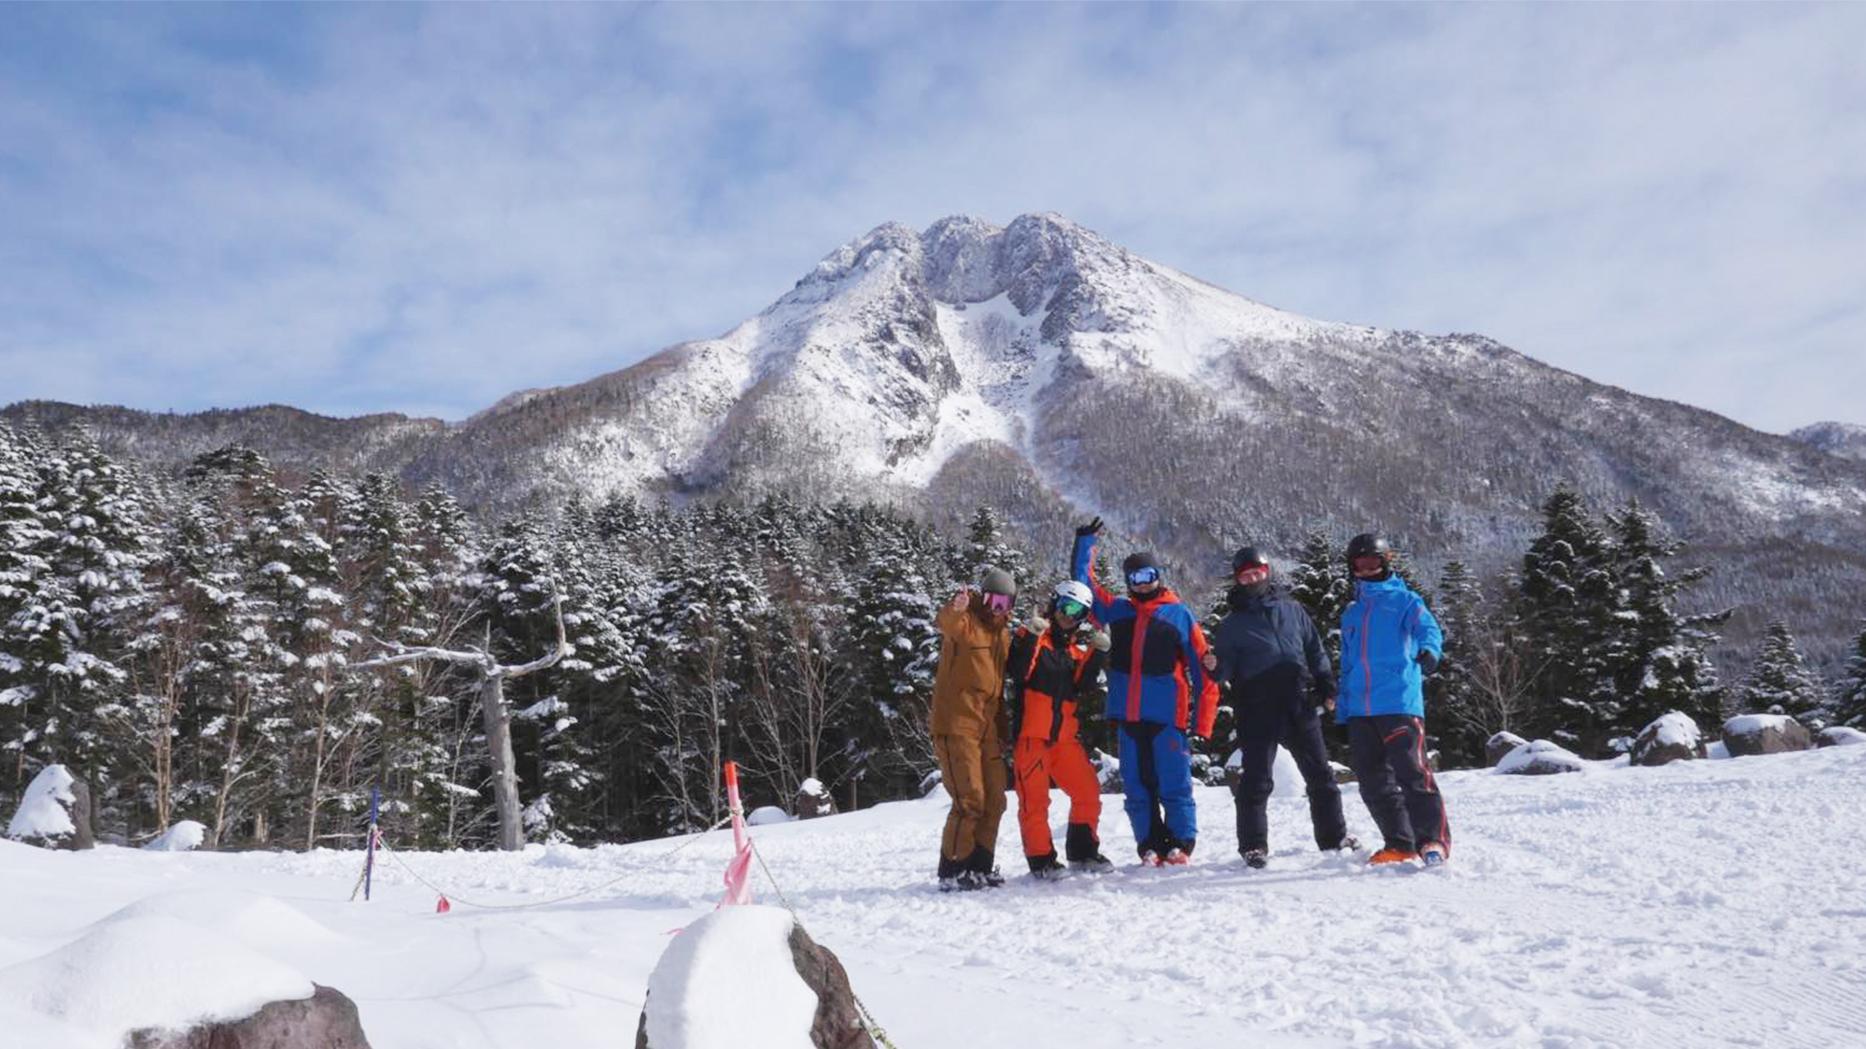 Peak Performance5人で日帰りスキー行ってきましたー!